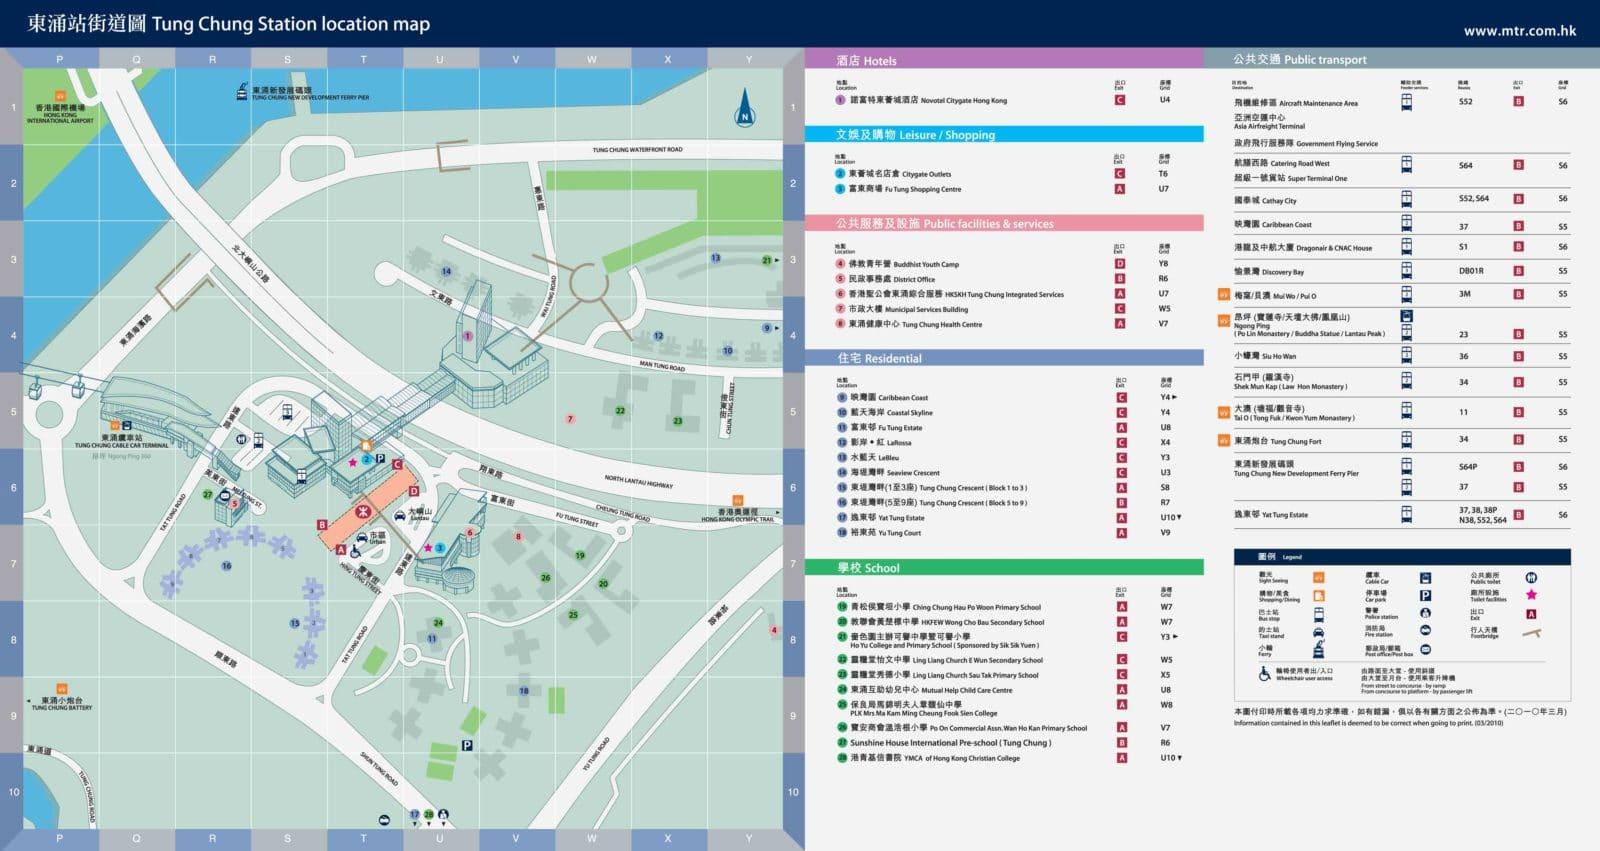 Lantau Island: Tung Chung MTR station area map 2012-2013